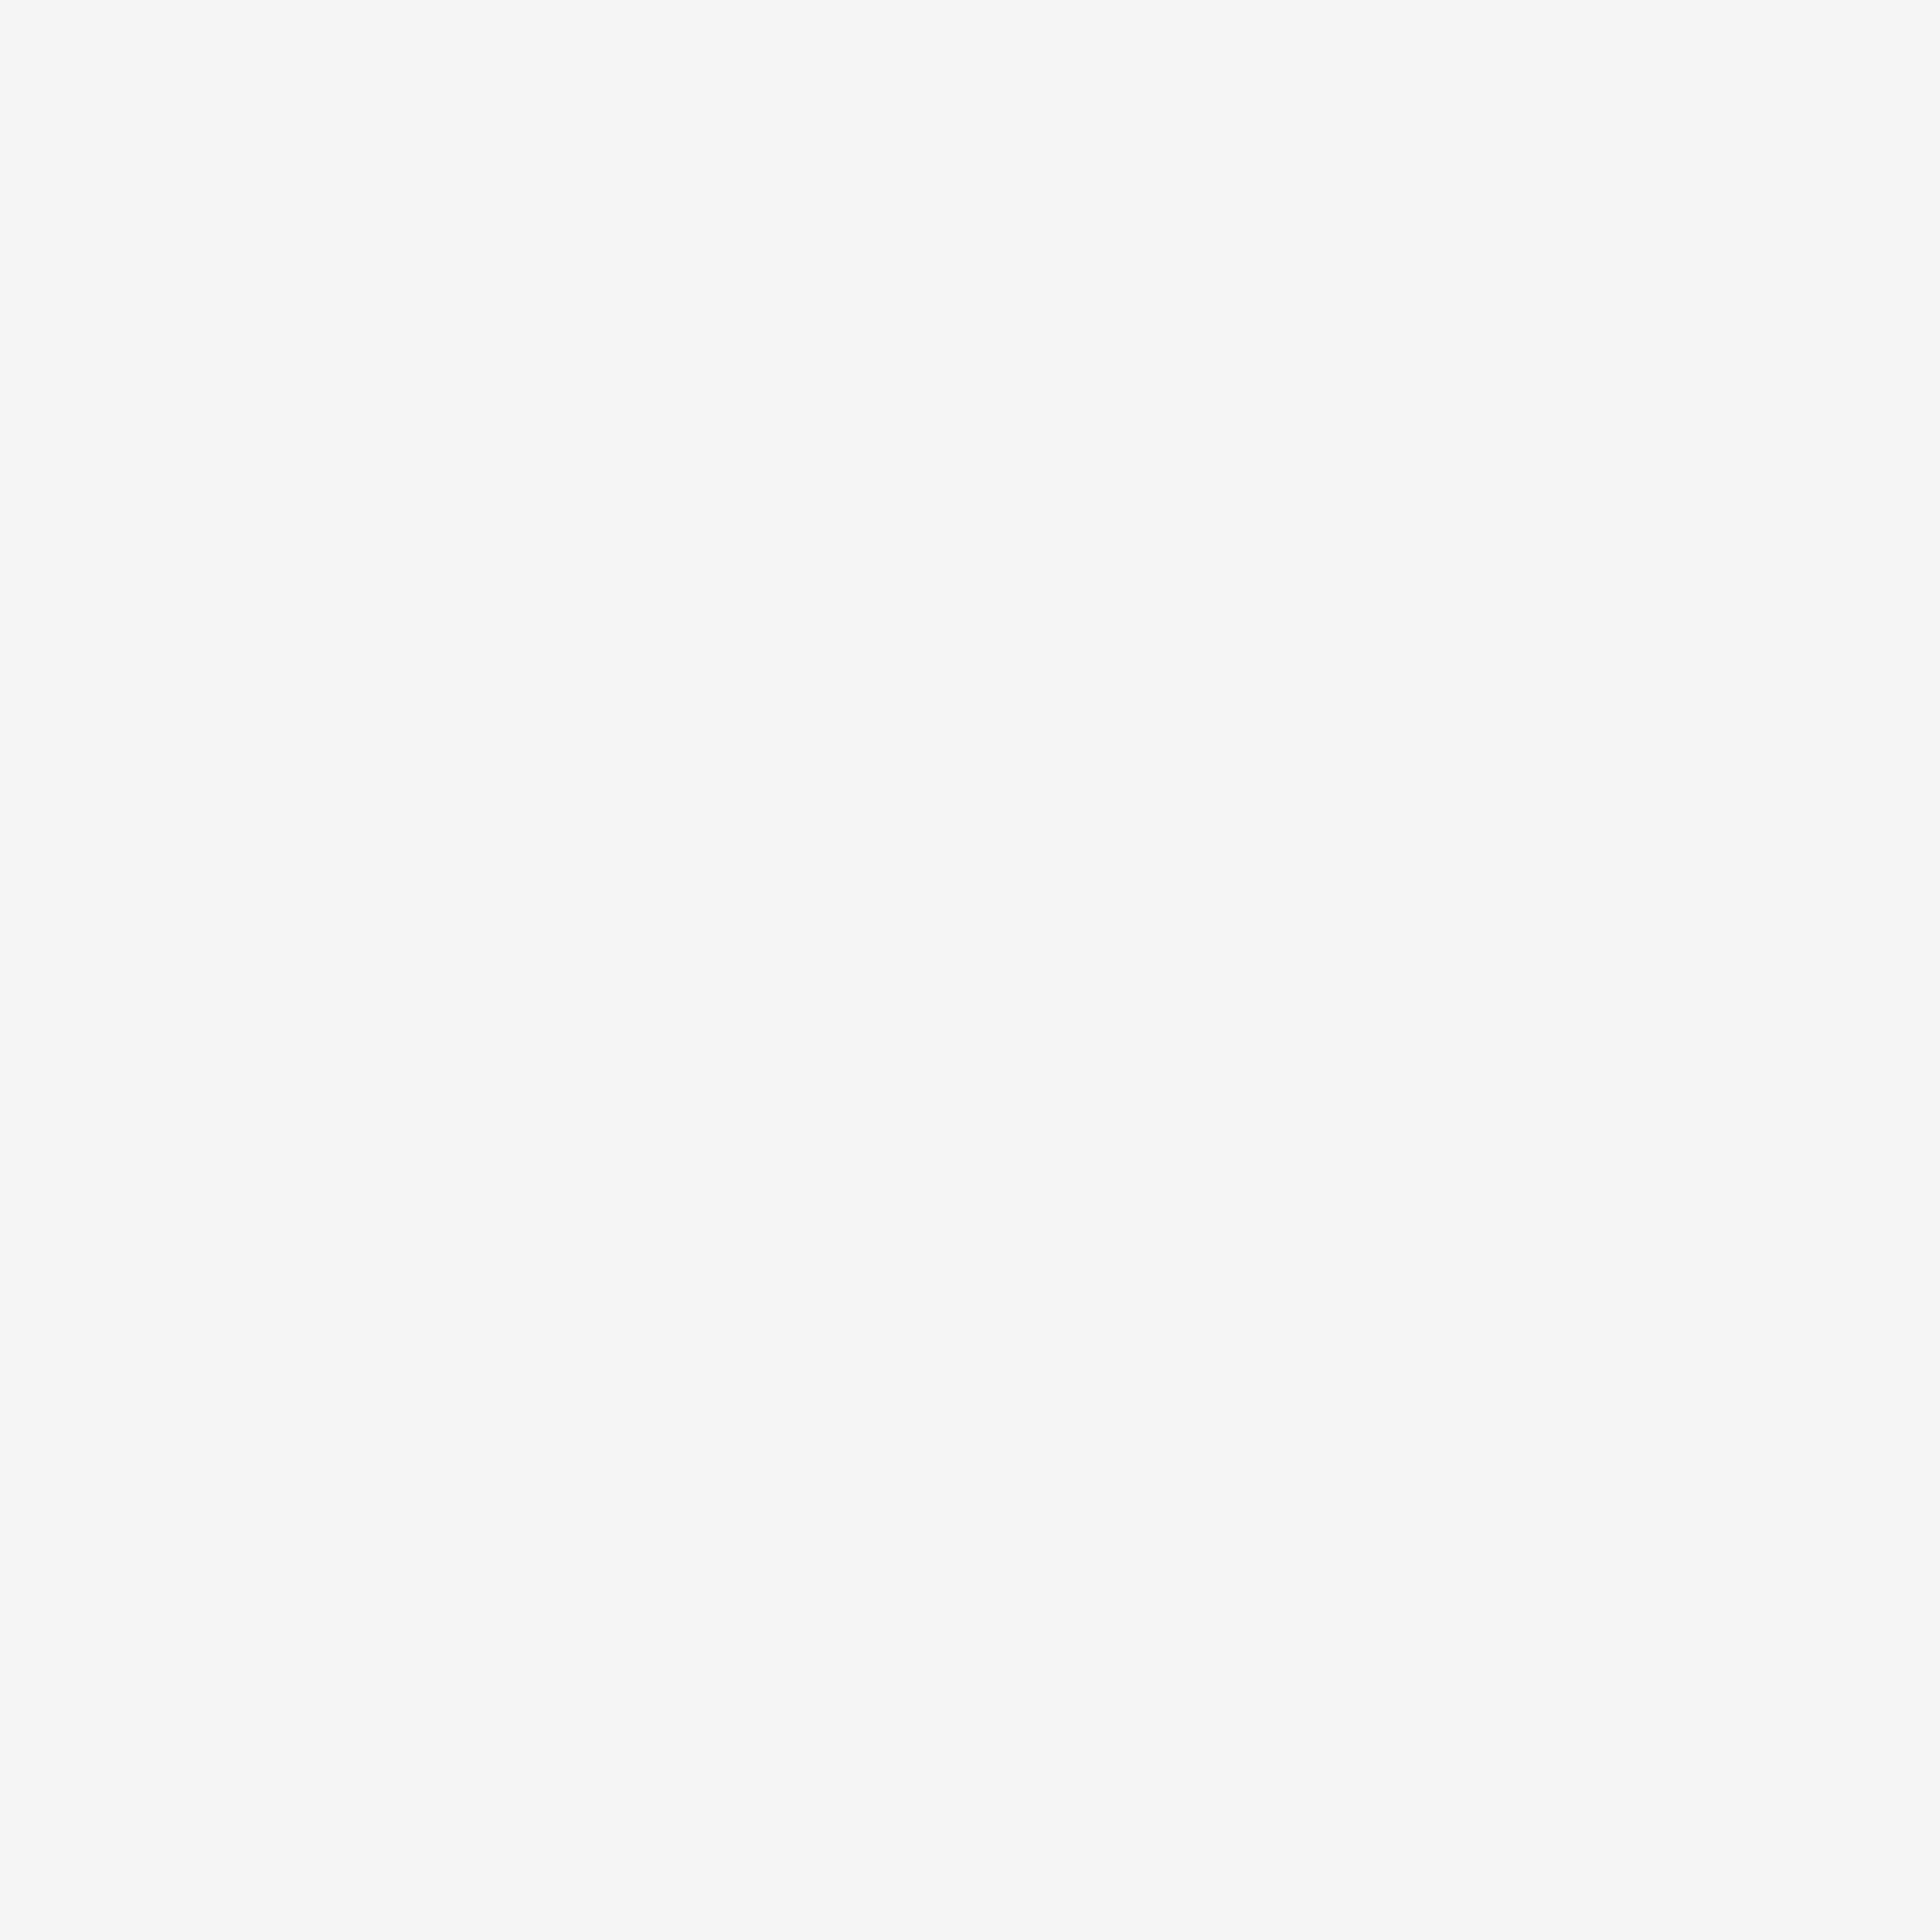 64875b047a1 Nike Flex Essential. 924344 001. Product afbeelding · Product afbeelding ·  Product afbeelding · Product afbeelding